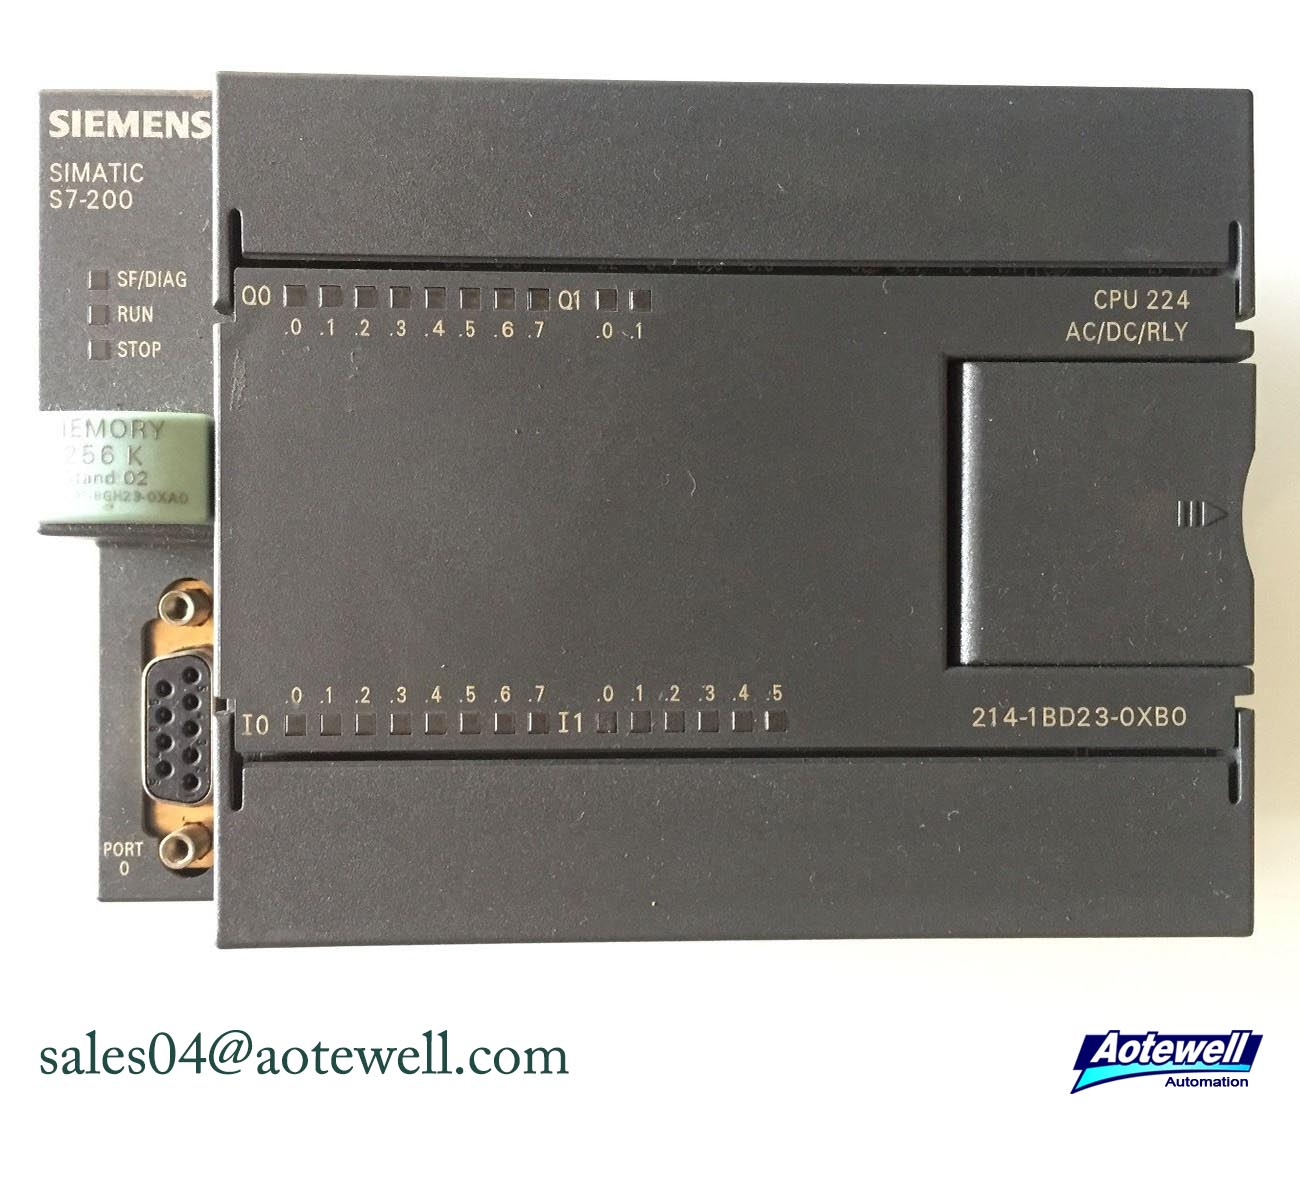 Siemens Simatic S7-200 Cpu Plc Module series